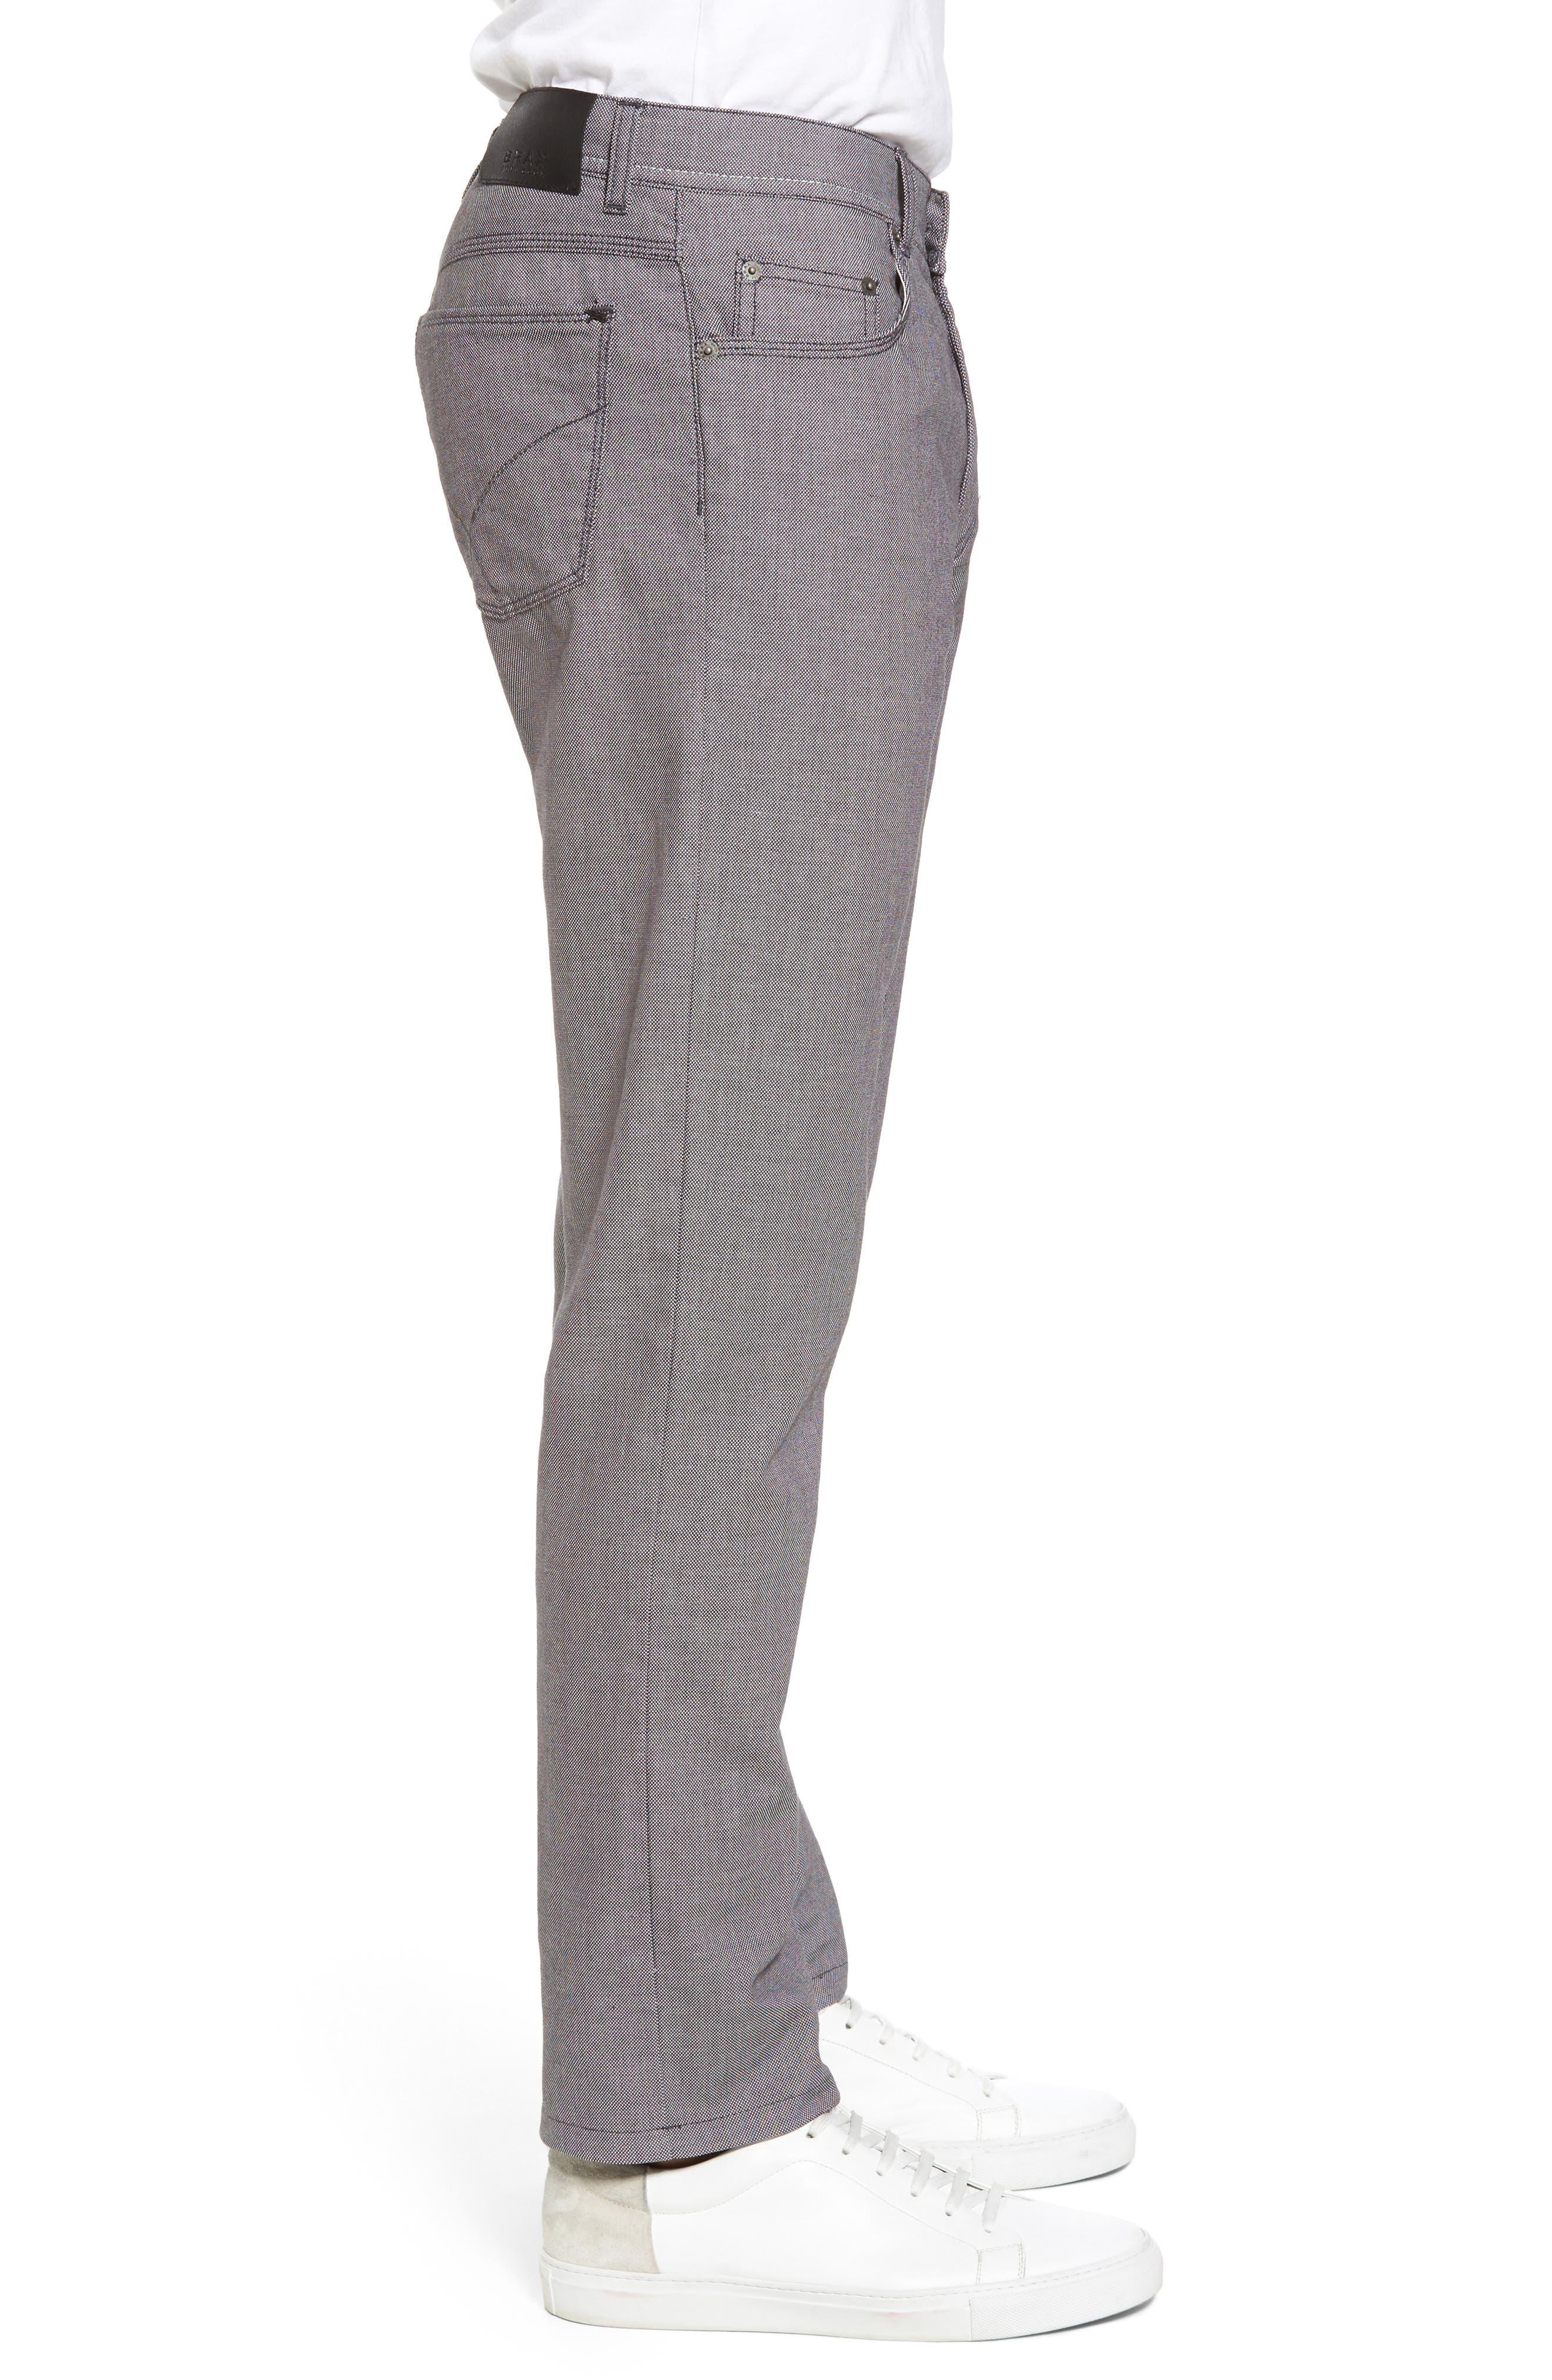 Cooper Bird's Eye Stretch Cotton Pants,                             Alternate thumbnail 3, color,                             Grey